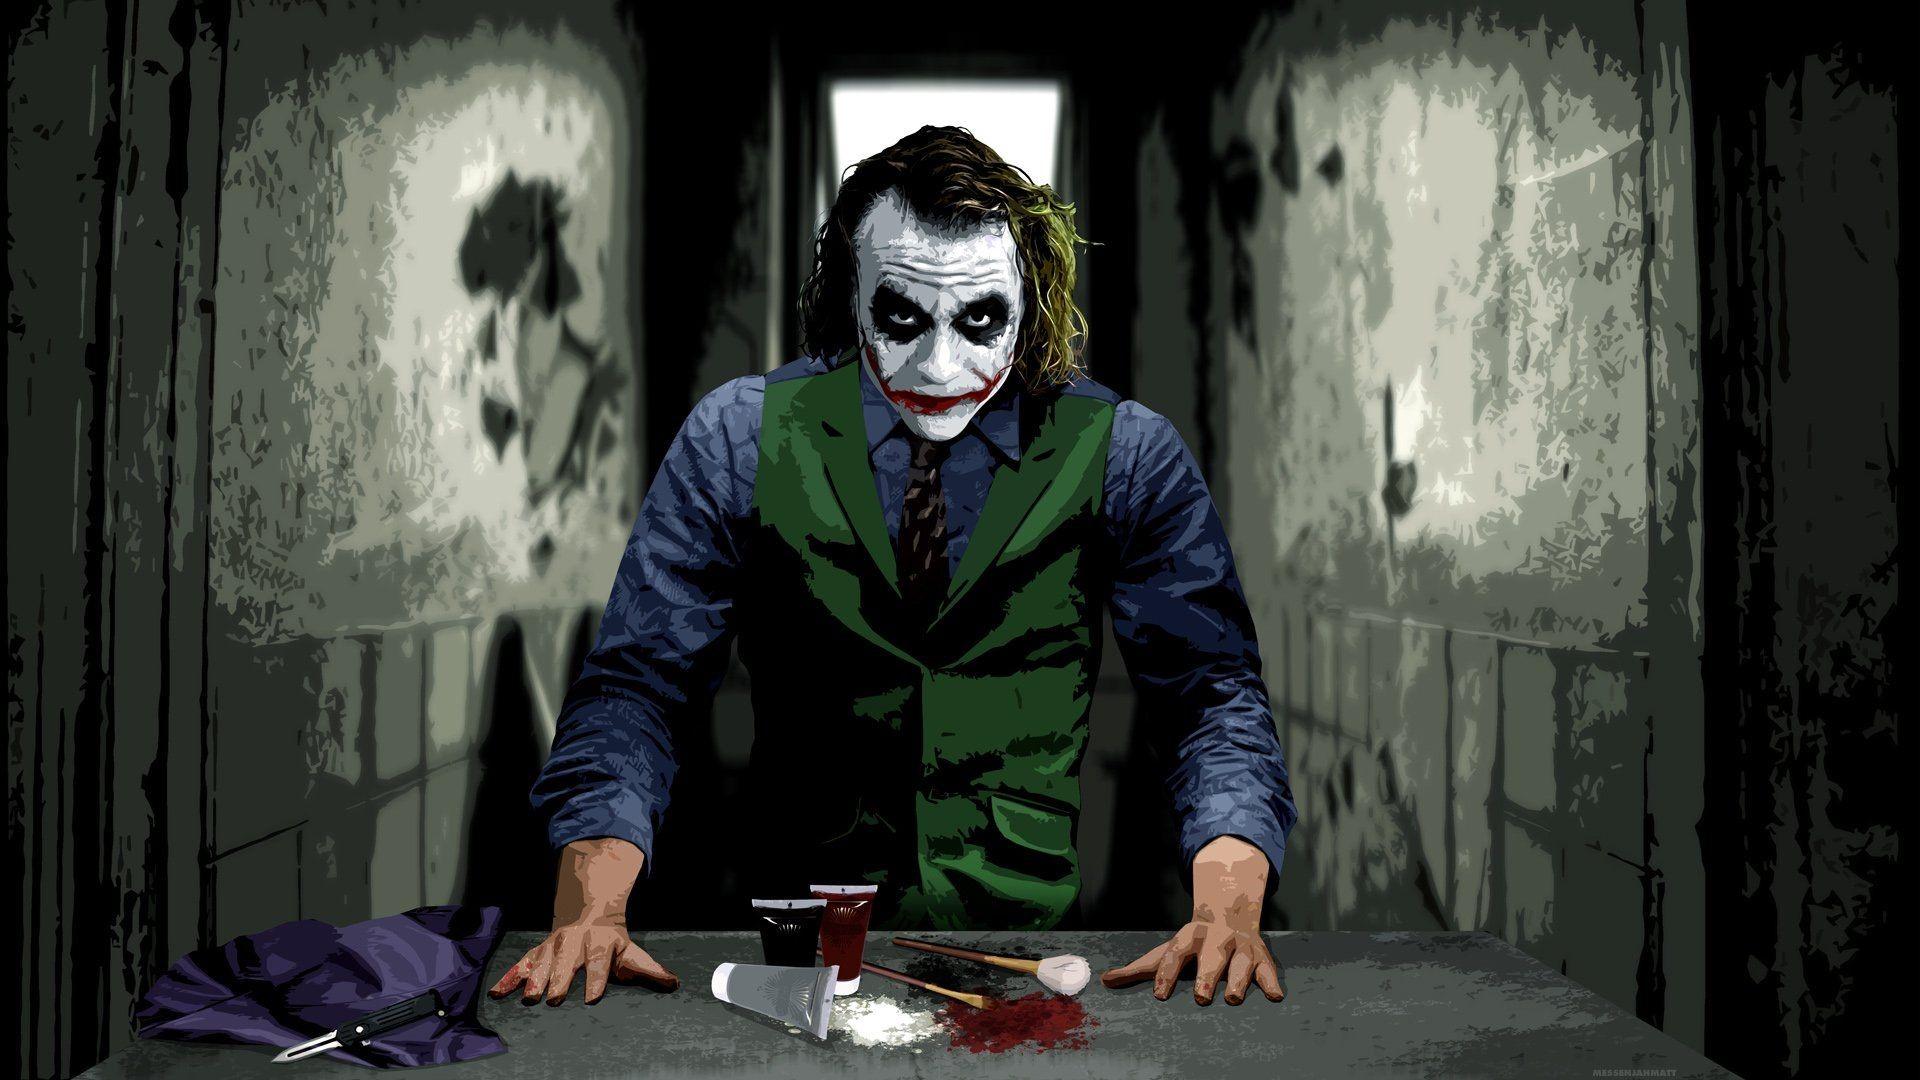 Joker Screensaver Wallpaper Download High Resolution 4k